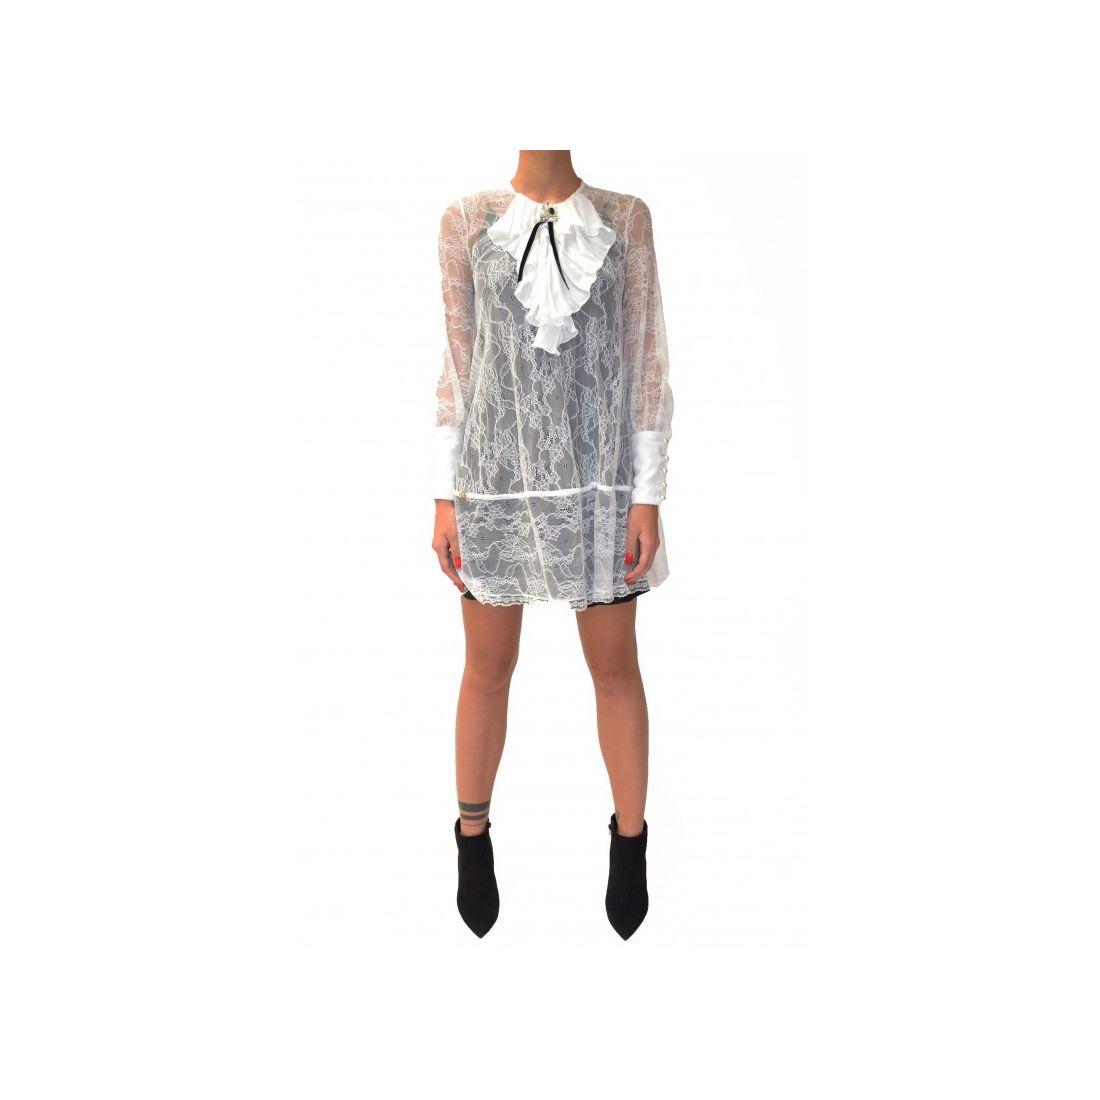 GIL SANTUCCI čiernobiele šaty s čipkou 997ddc67880